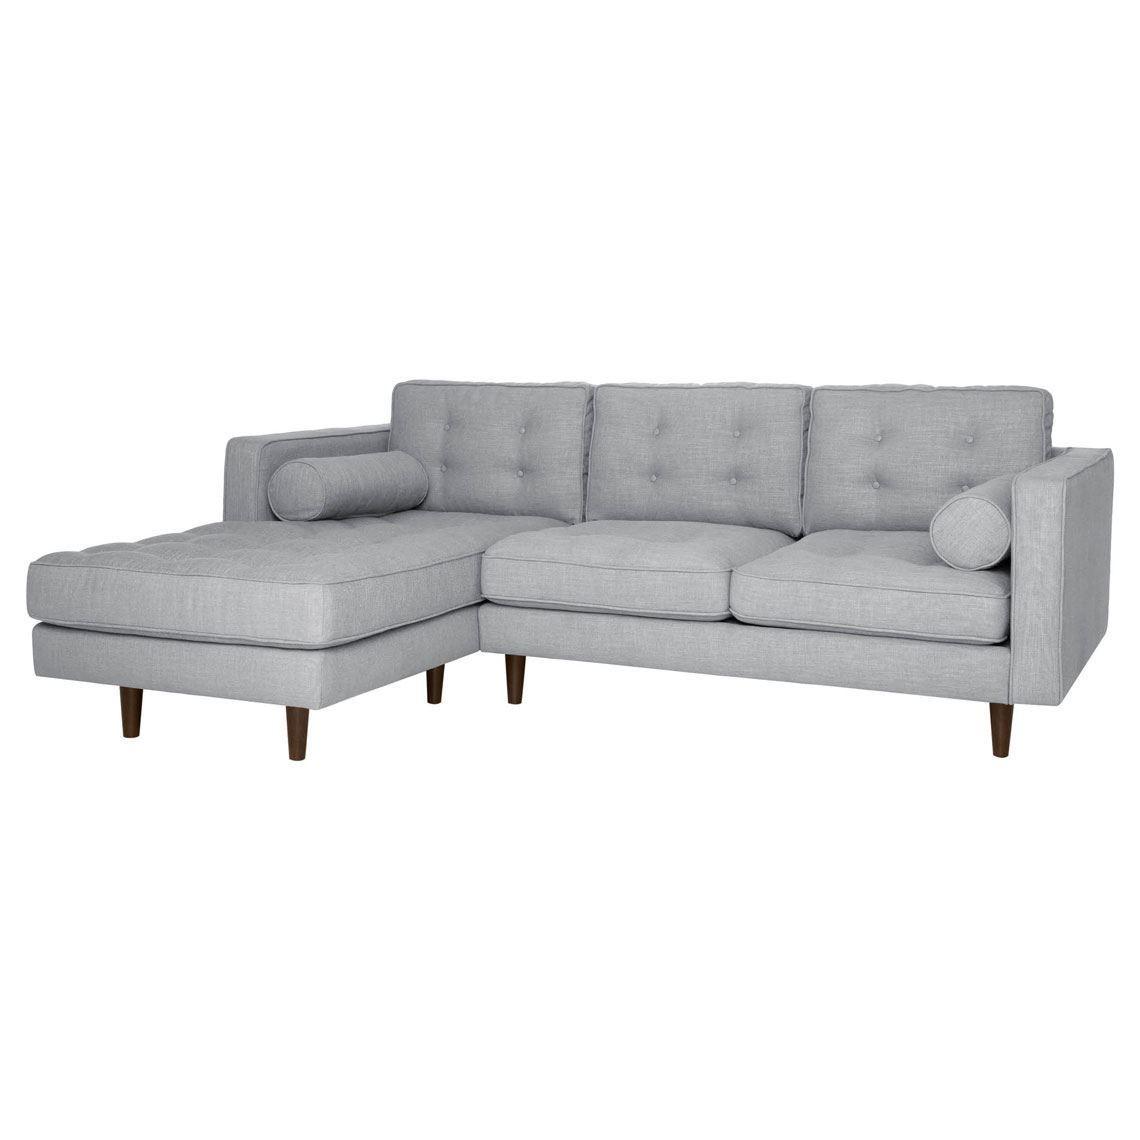 Copenhagen 2 Seat Fabric W Left Chaise Size W 229cm X D 177cm X H 83cm In Light Grey Fabric Foam Fibre Freedom In 2020 Modular Sofa Sofa Mid Century Design